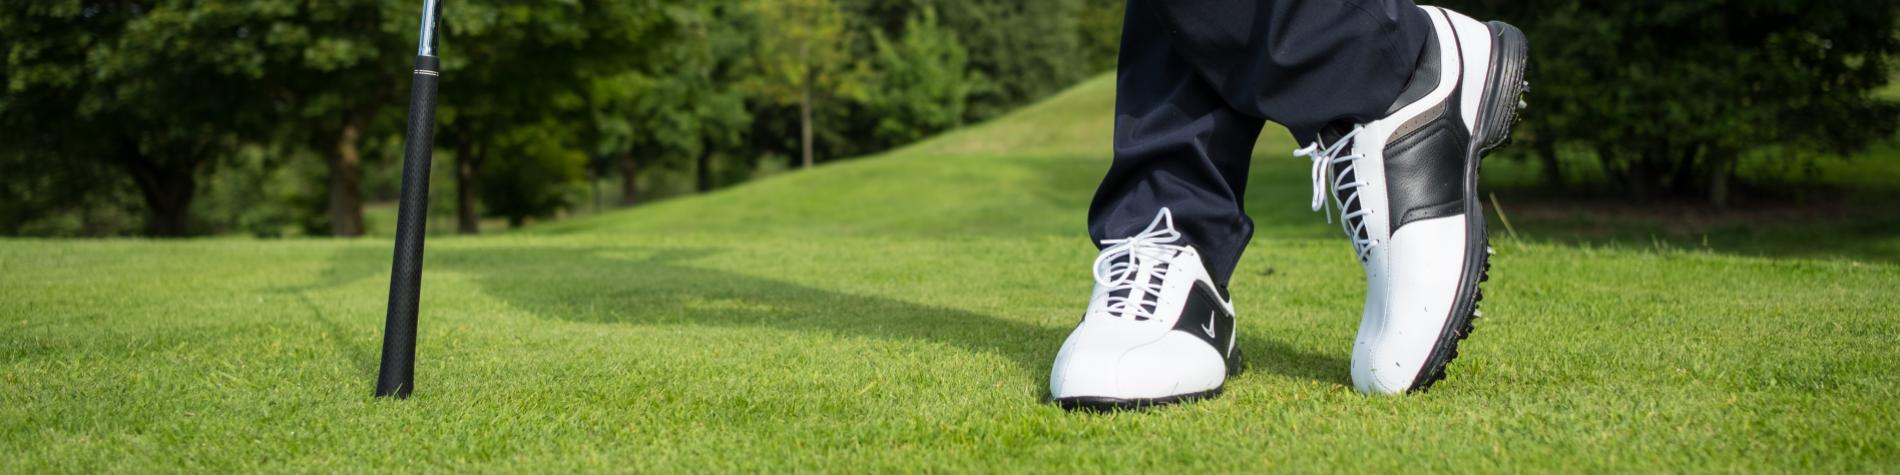 Golf - Château - Tournette - cours - club - green - handicap - play off